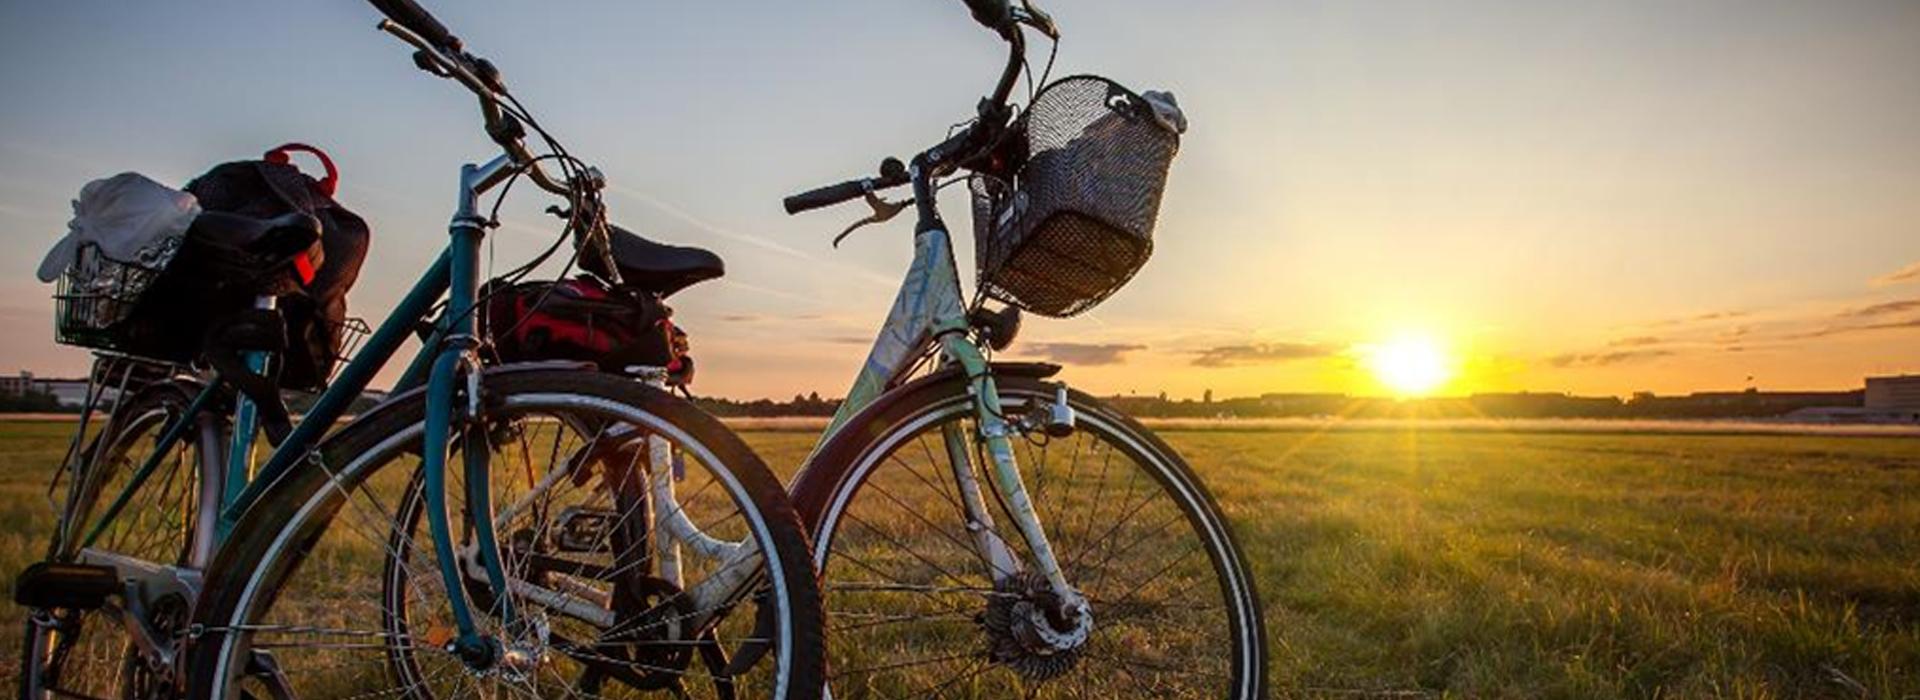 agriturismo a roselle il bagnolo bici